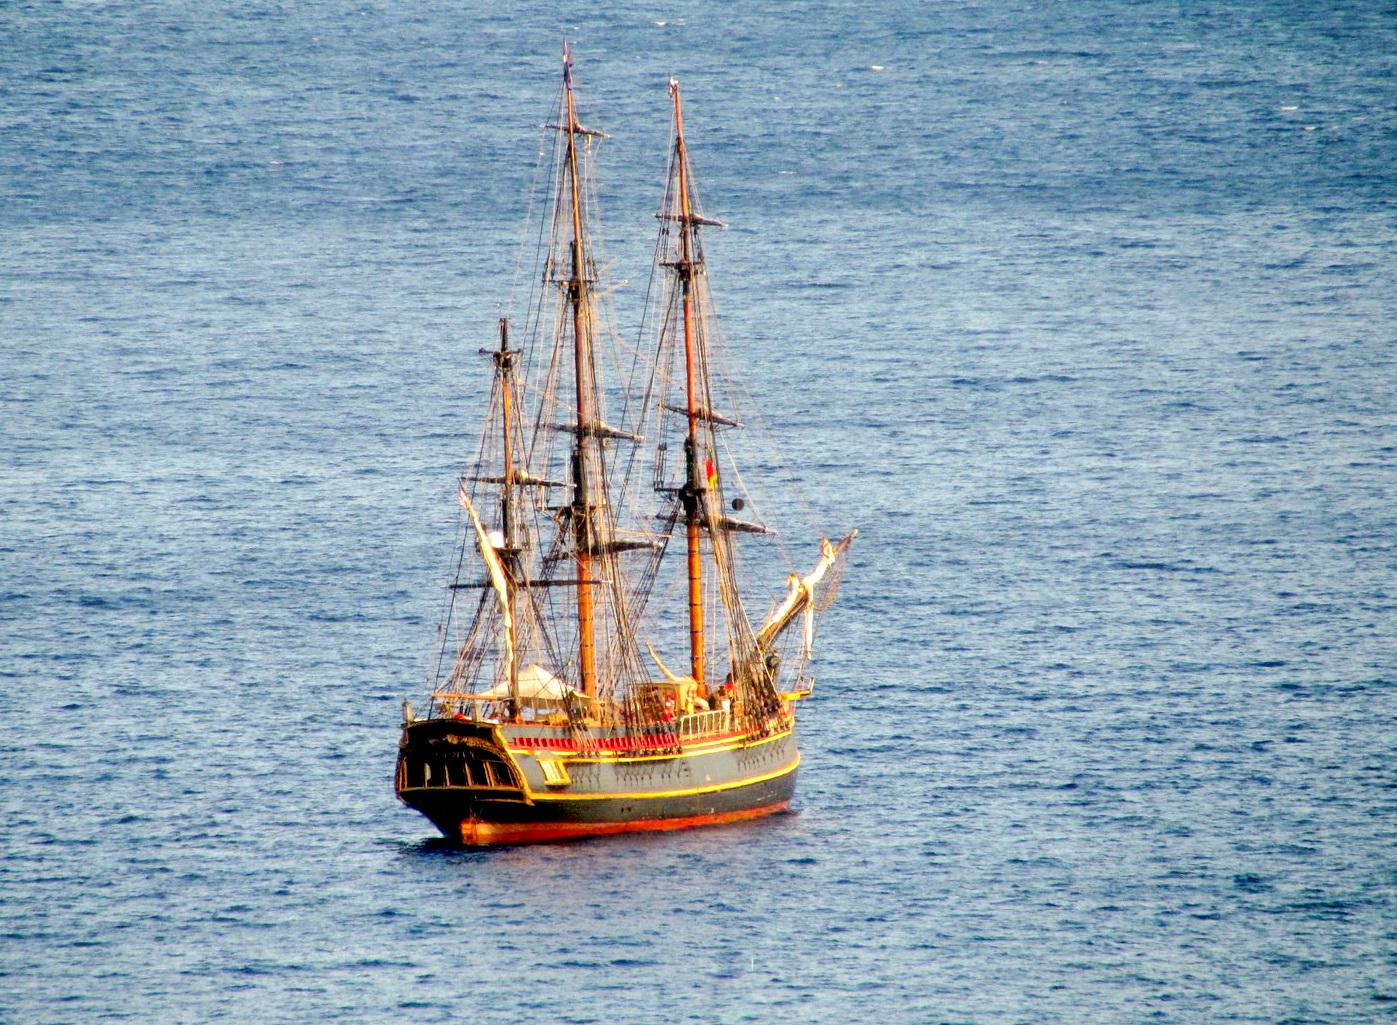 Bounty tall ship in Funchal